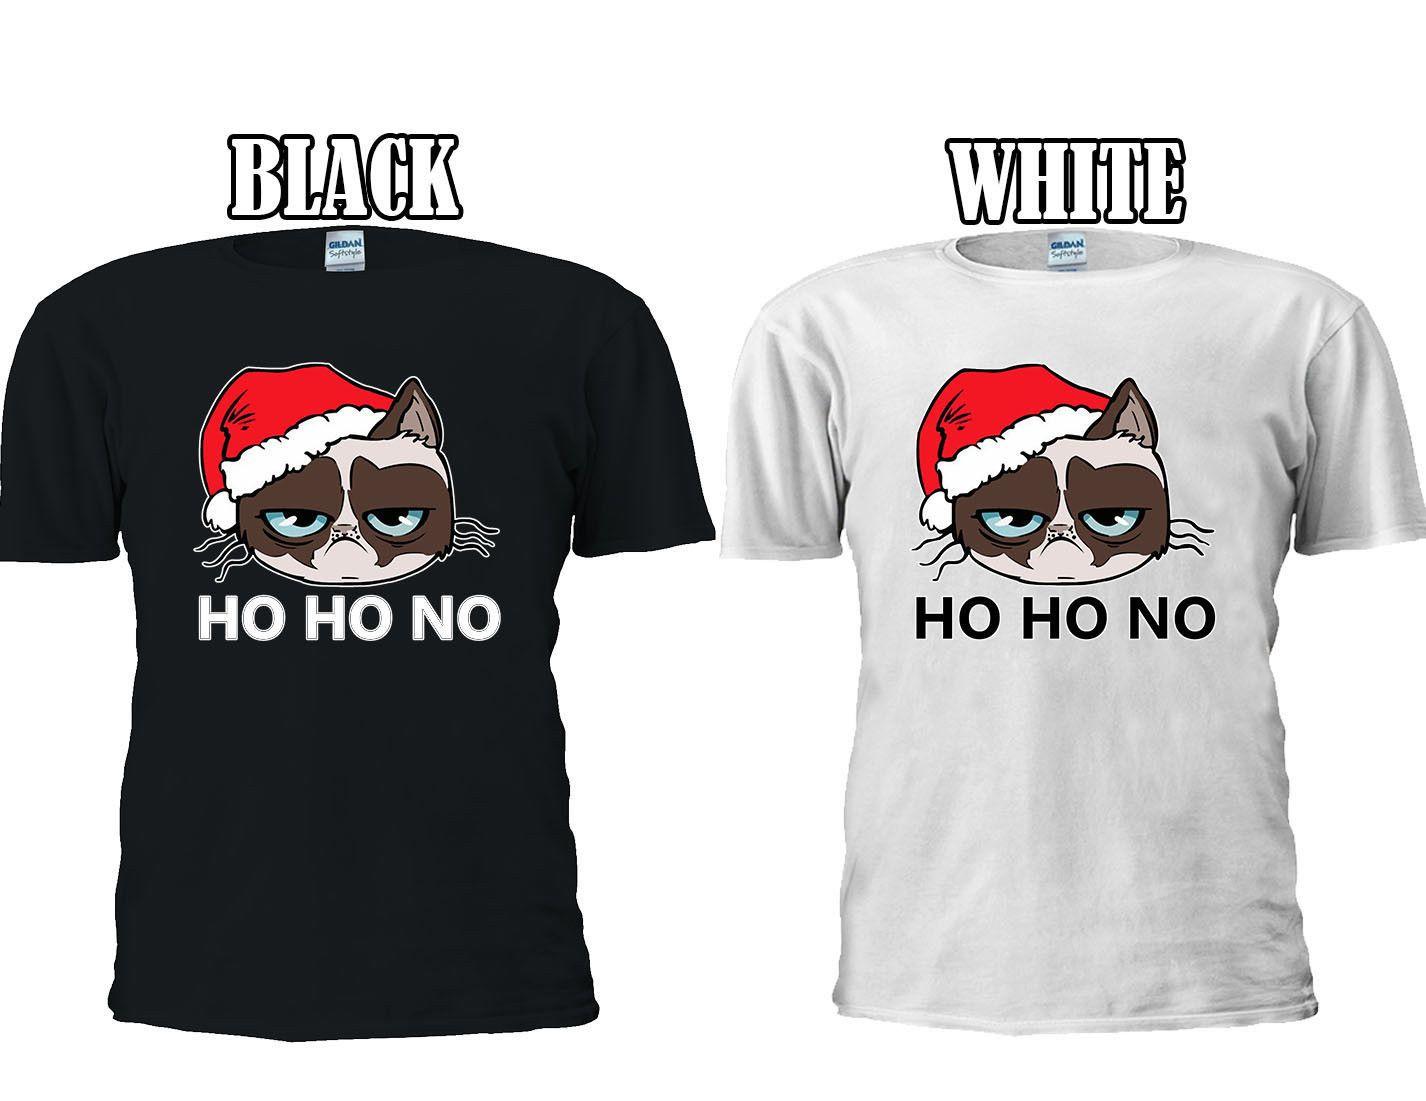 grumpy santa cat christmas xmas crus t shirt baseball vest men women unisex 2664 cartoon t shirt men unisex new fashion t shirt t tee shirts online shopping